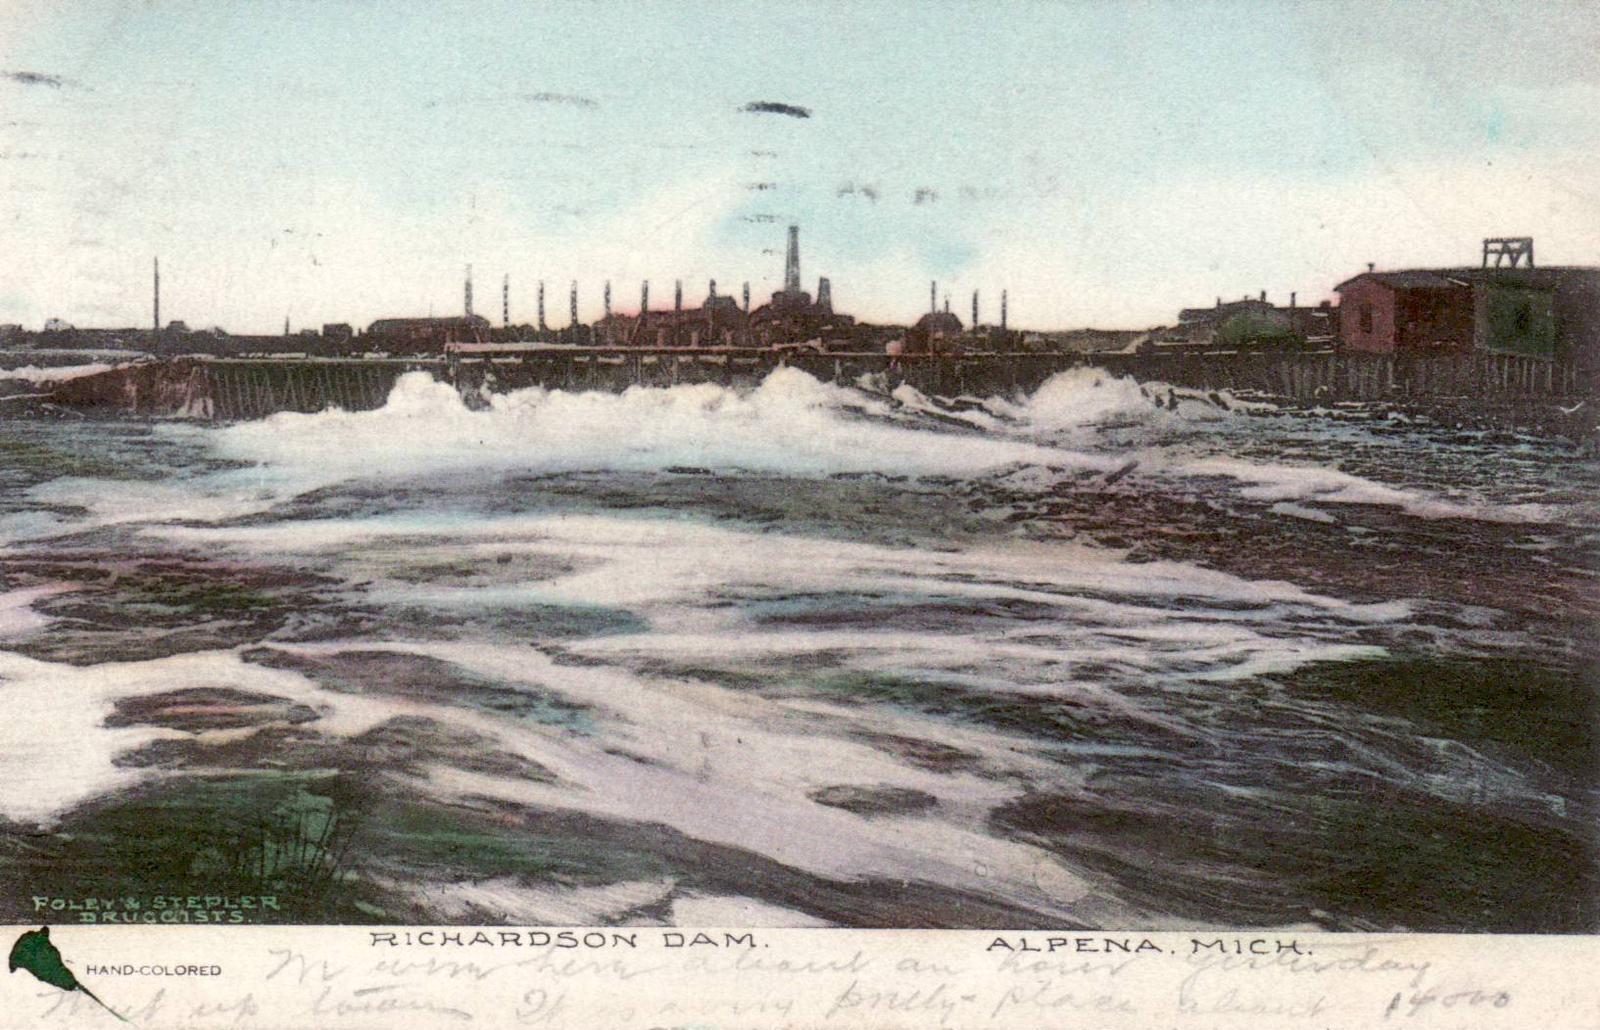 Richardson Dam